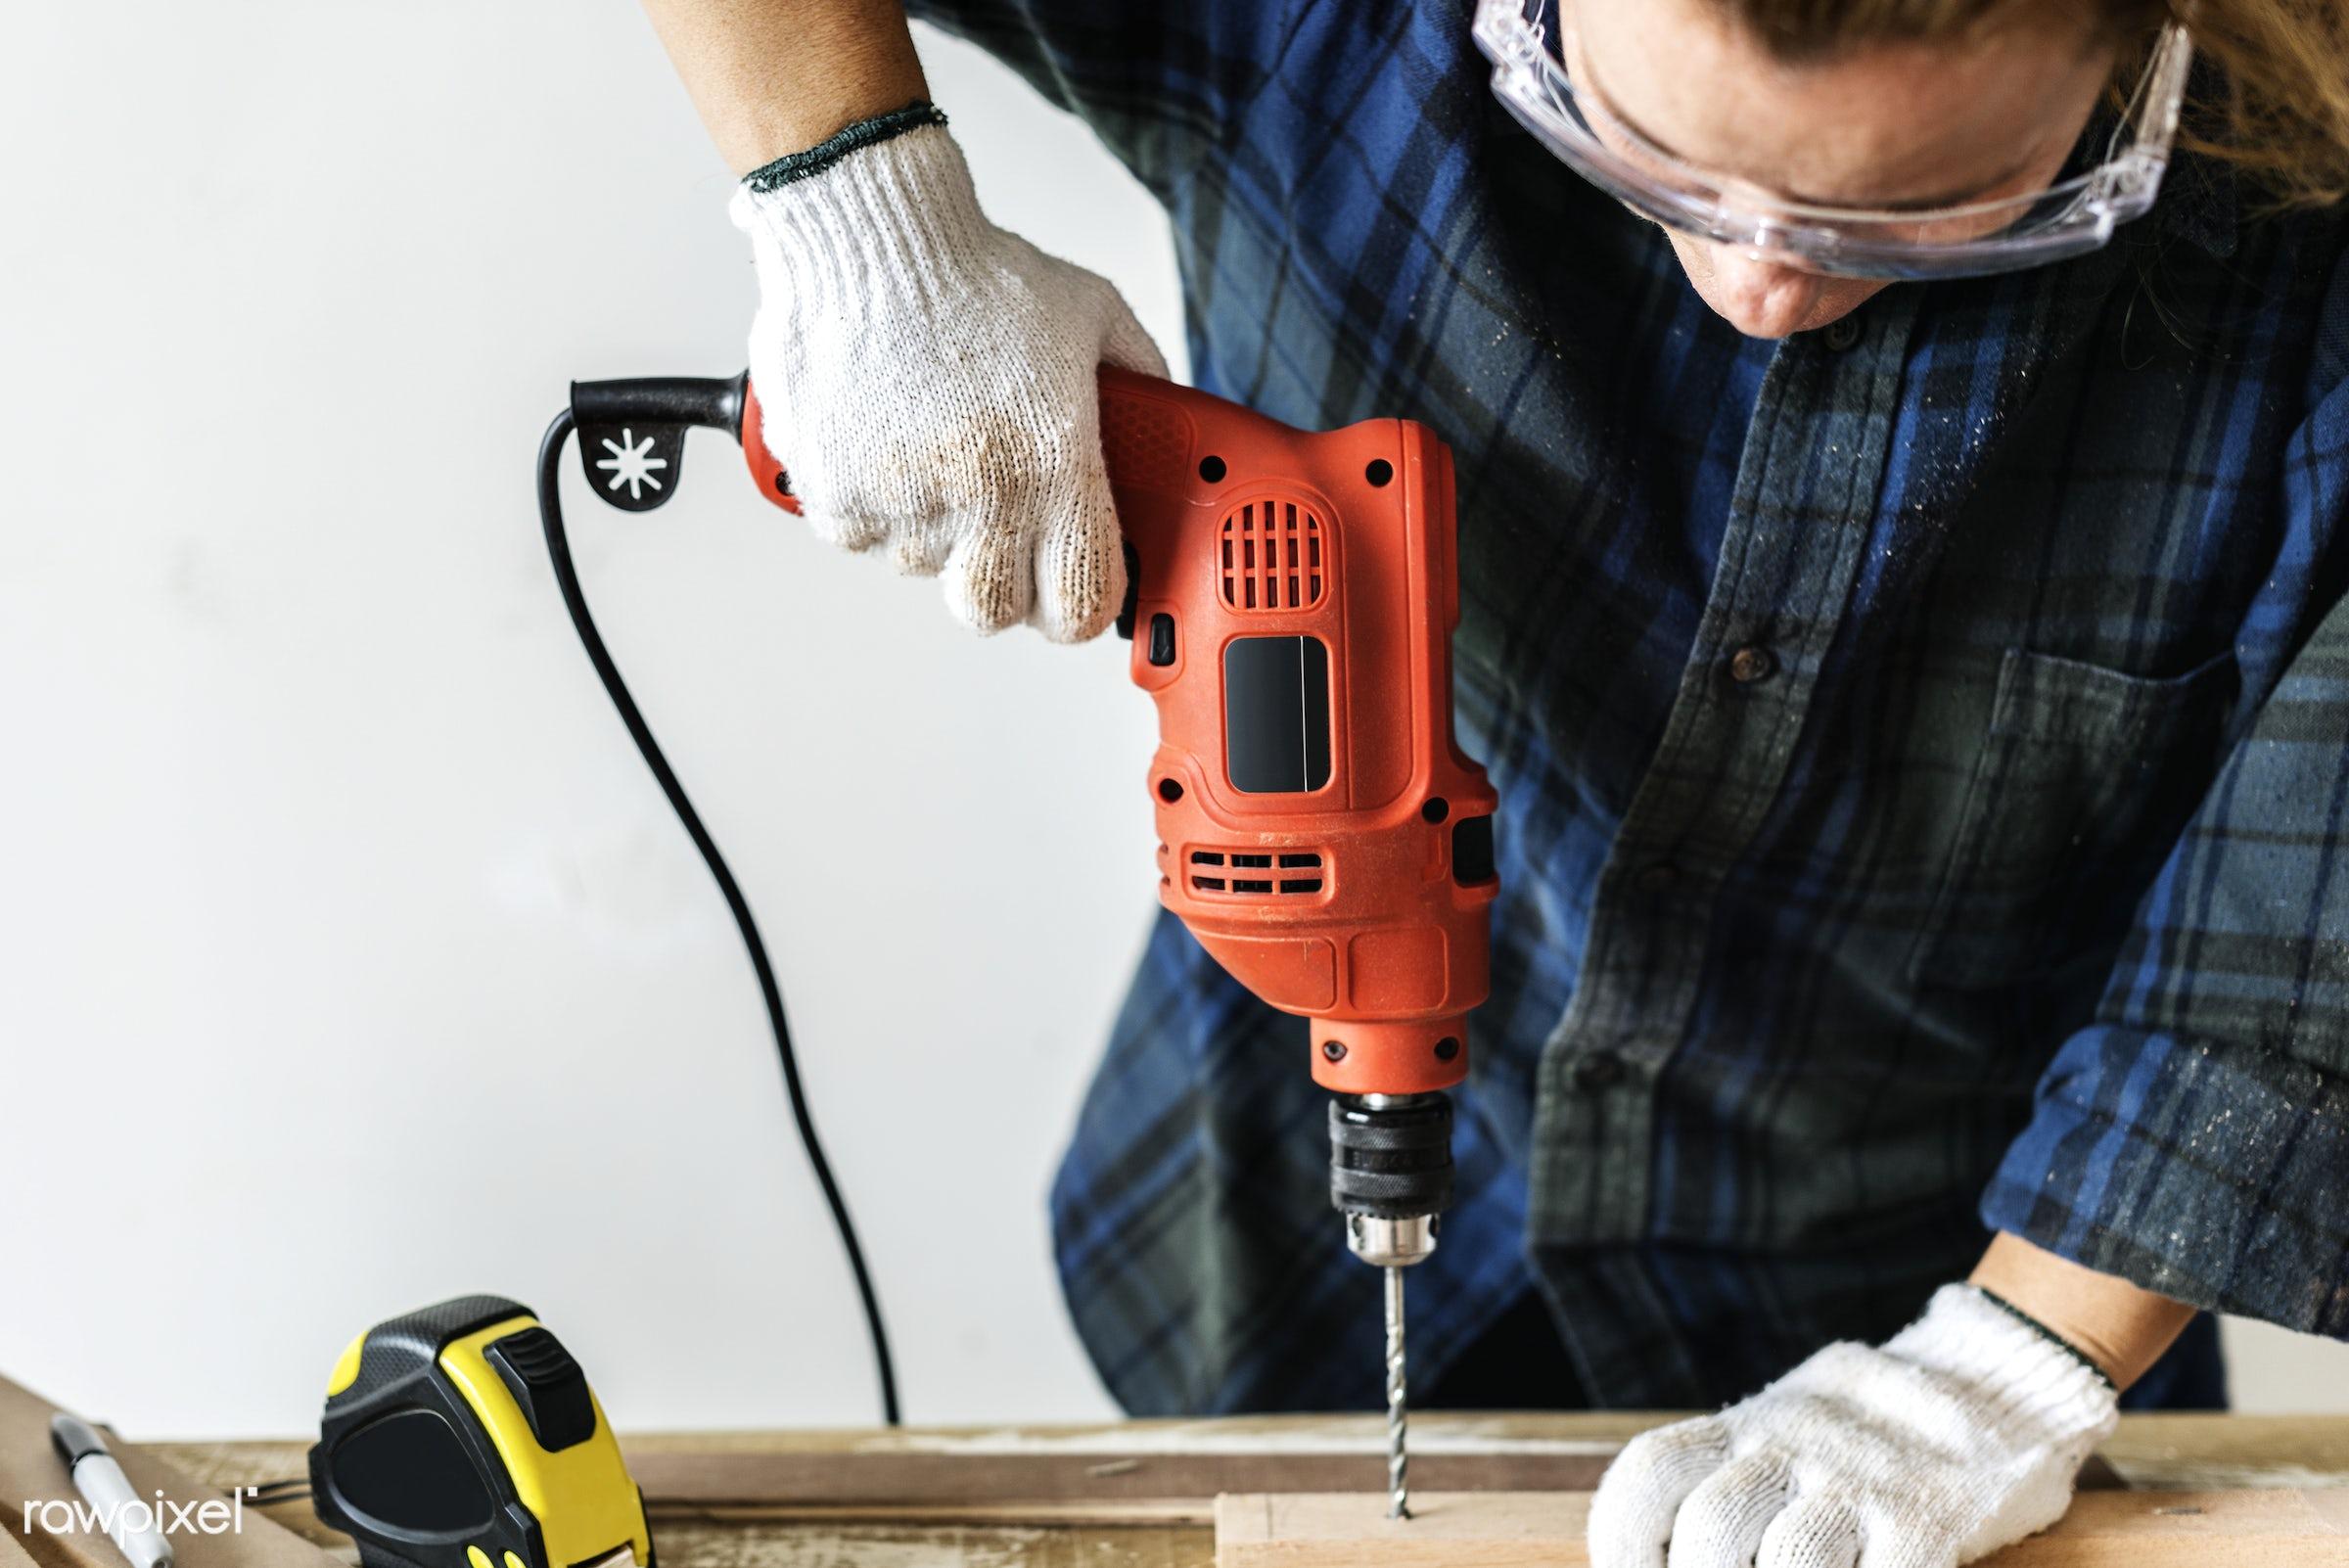 home, technician, development, wood, tool, equipment, house, engineering, installation, repairman, woman, carpenter,...